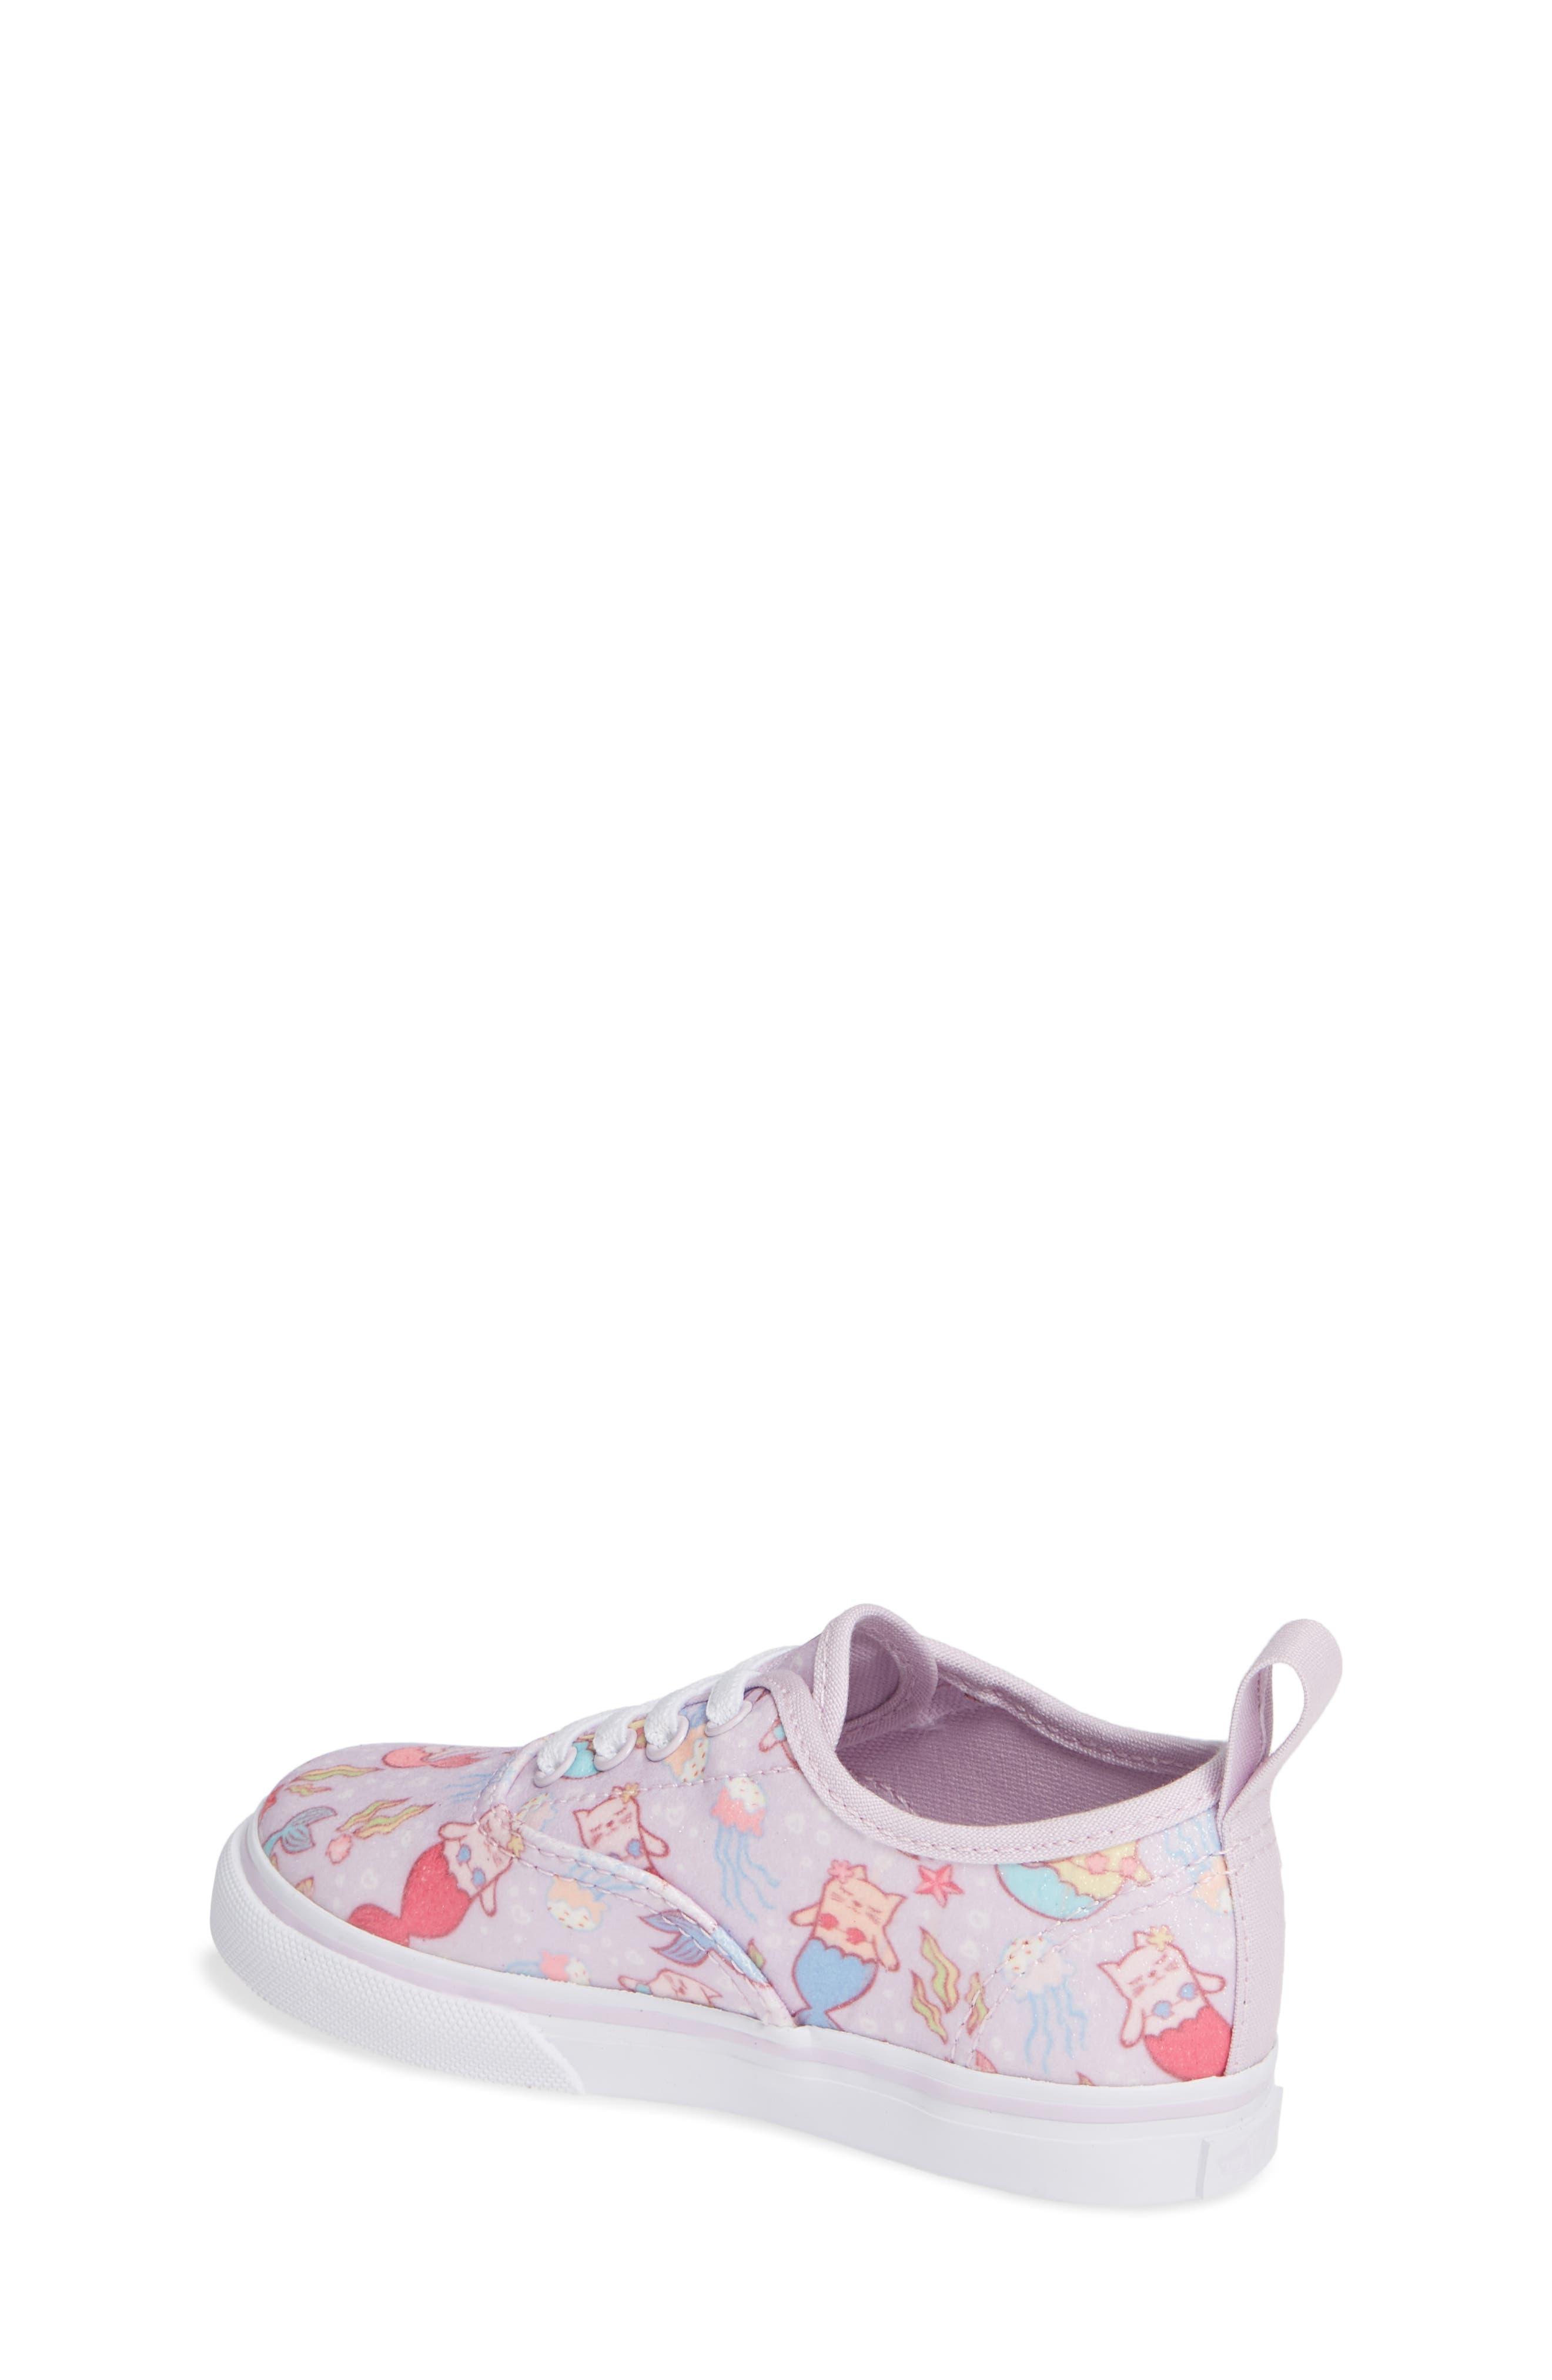 Authentic Elastic Lace Sneaker,                             Alternate thumbnail 2, color,                             Lavender Fog/ True White